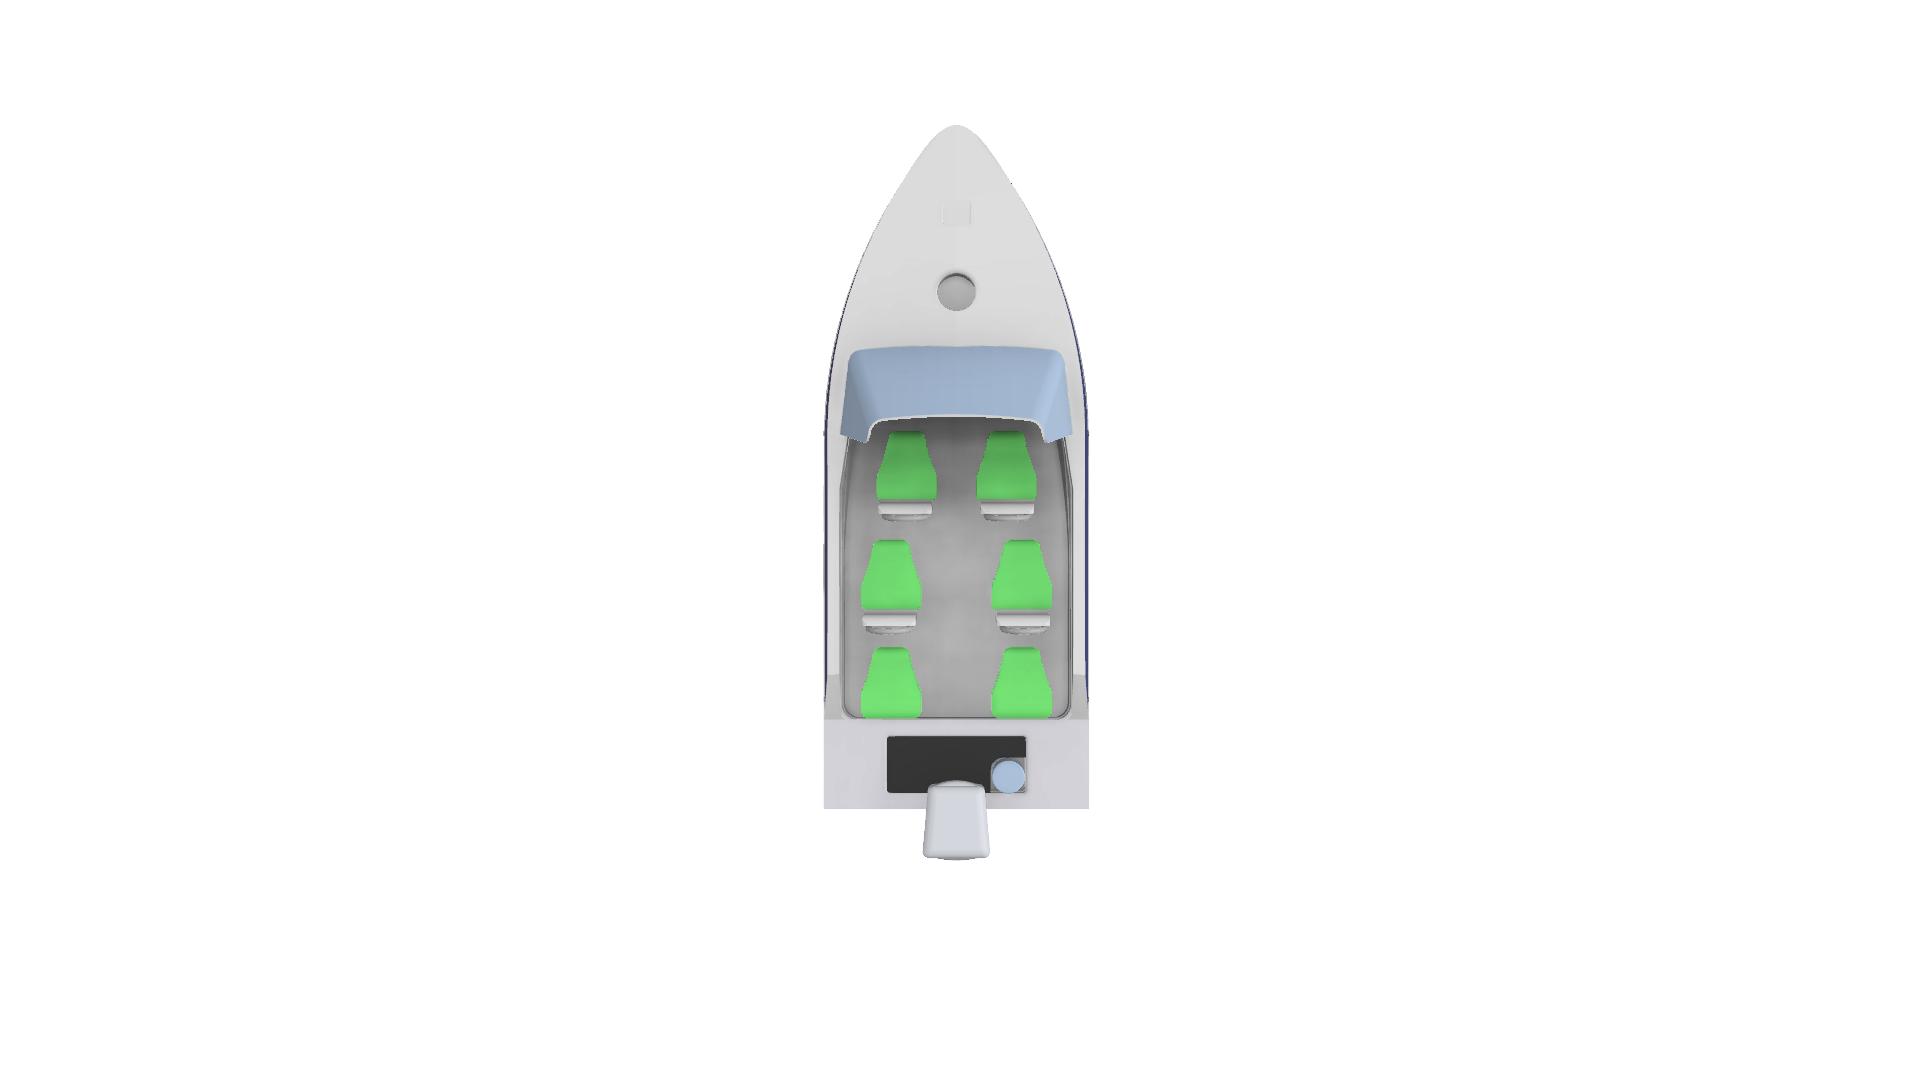 T55-A003 Tacht_ASM_w6Seat v3